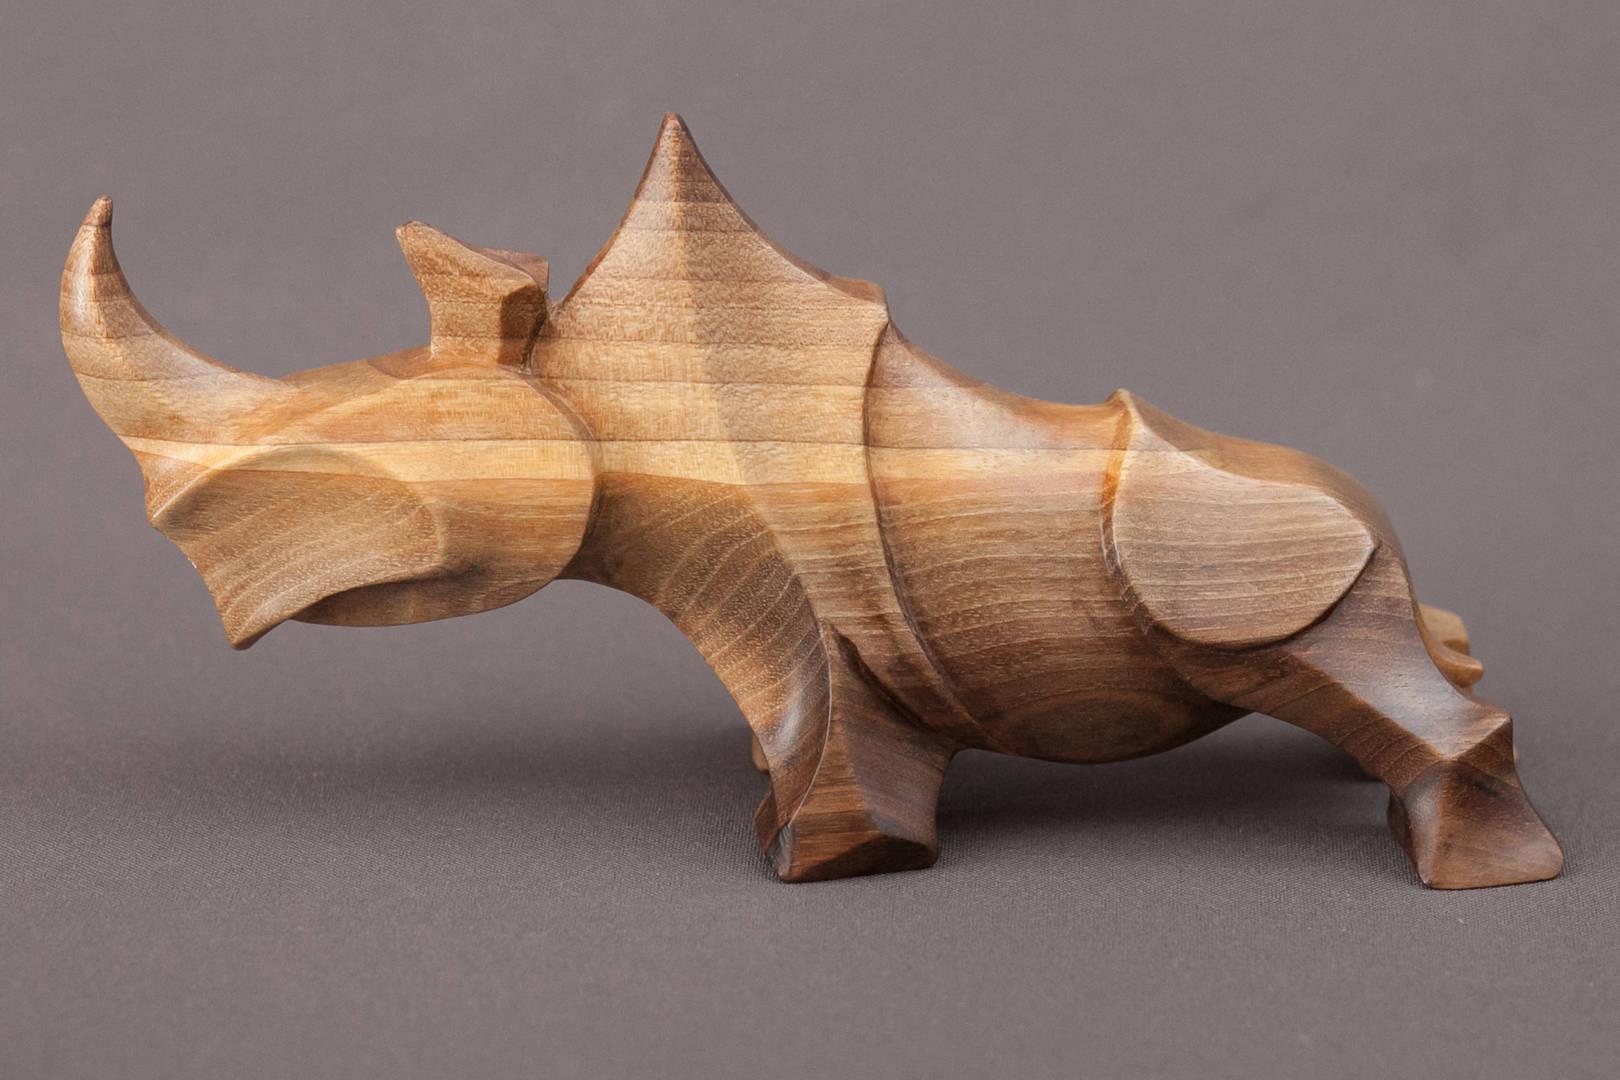 Носорог. Скульптура. Размеры; 10х20х6см.  Материал; дерево орех.